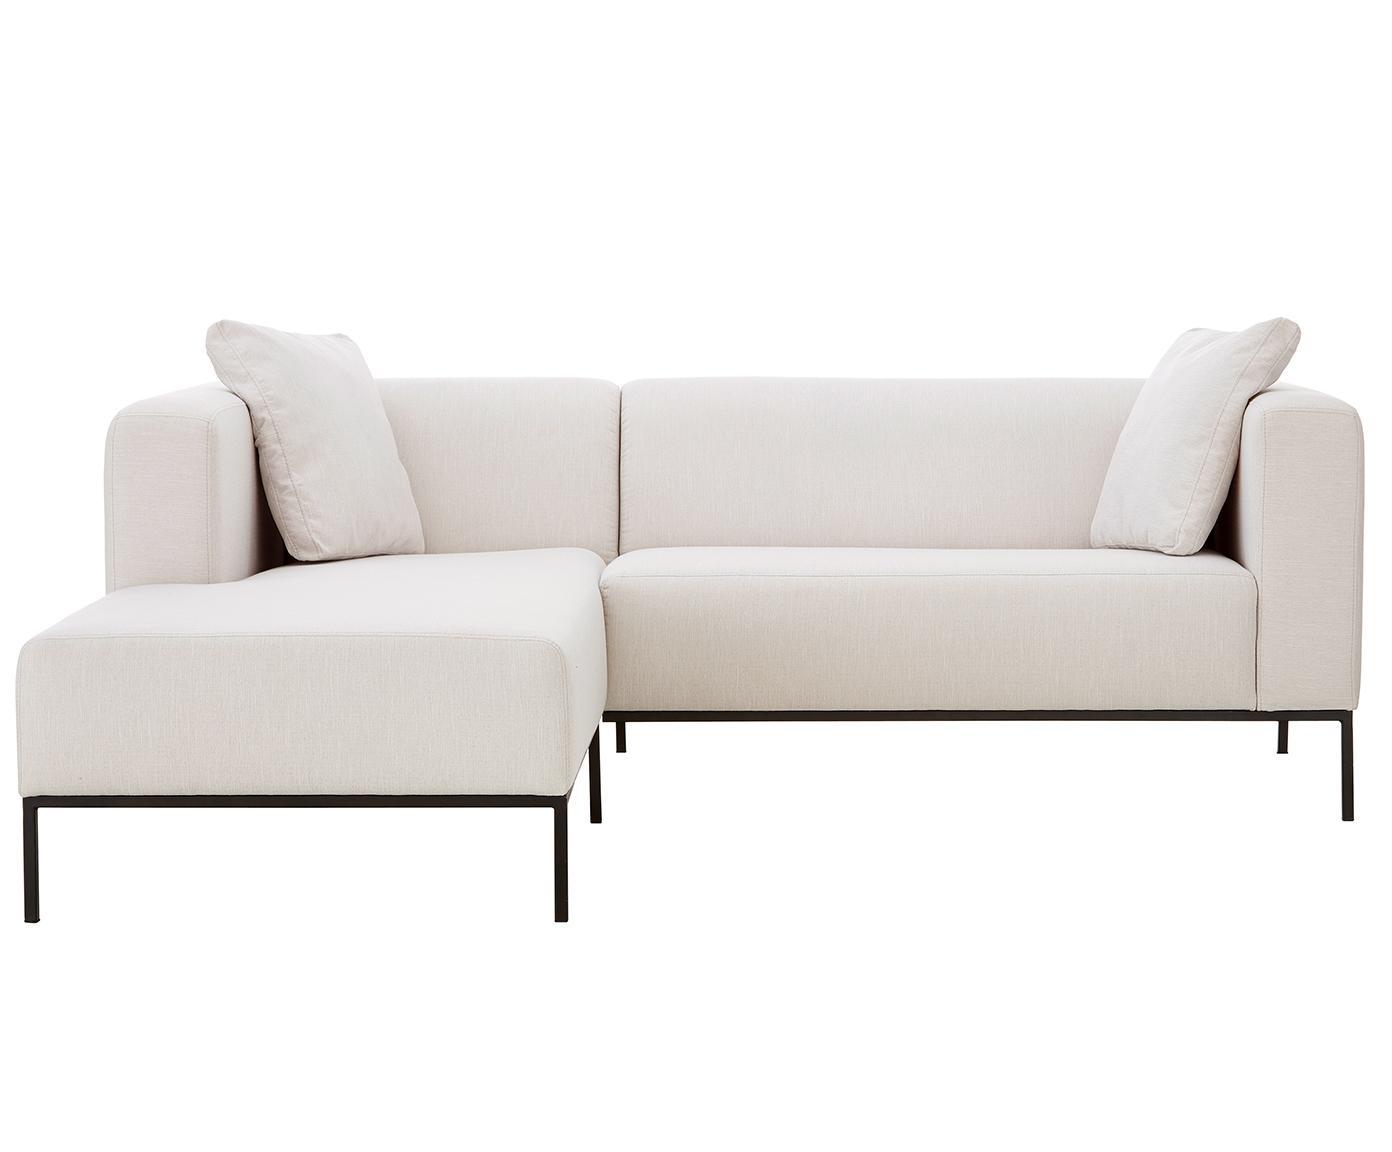 Hoekbank Carrie, Bekleding: polyester, Frame: spaanplaat, hardboard, mu, Poten: gelakt metaal, Webstoff Beige, B 241 x D 200 cm